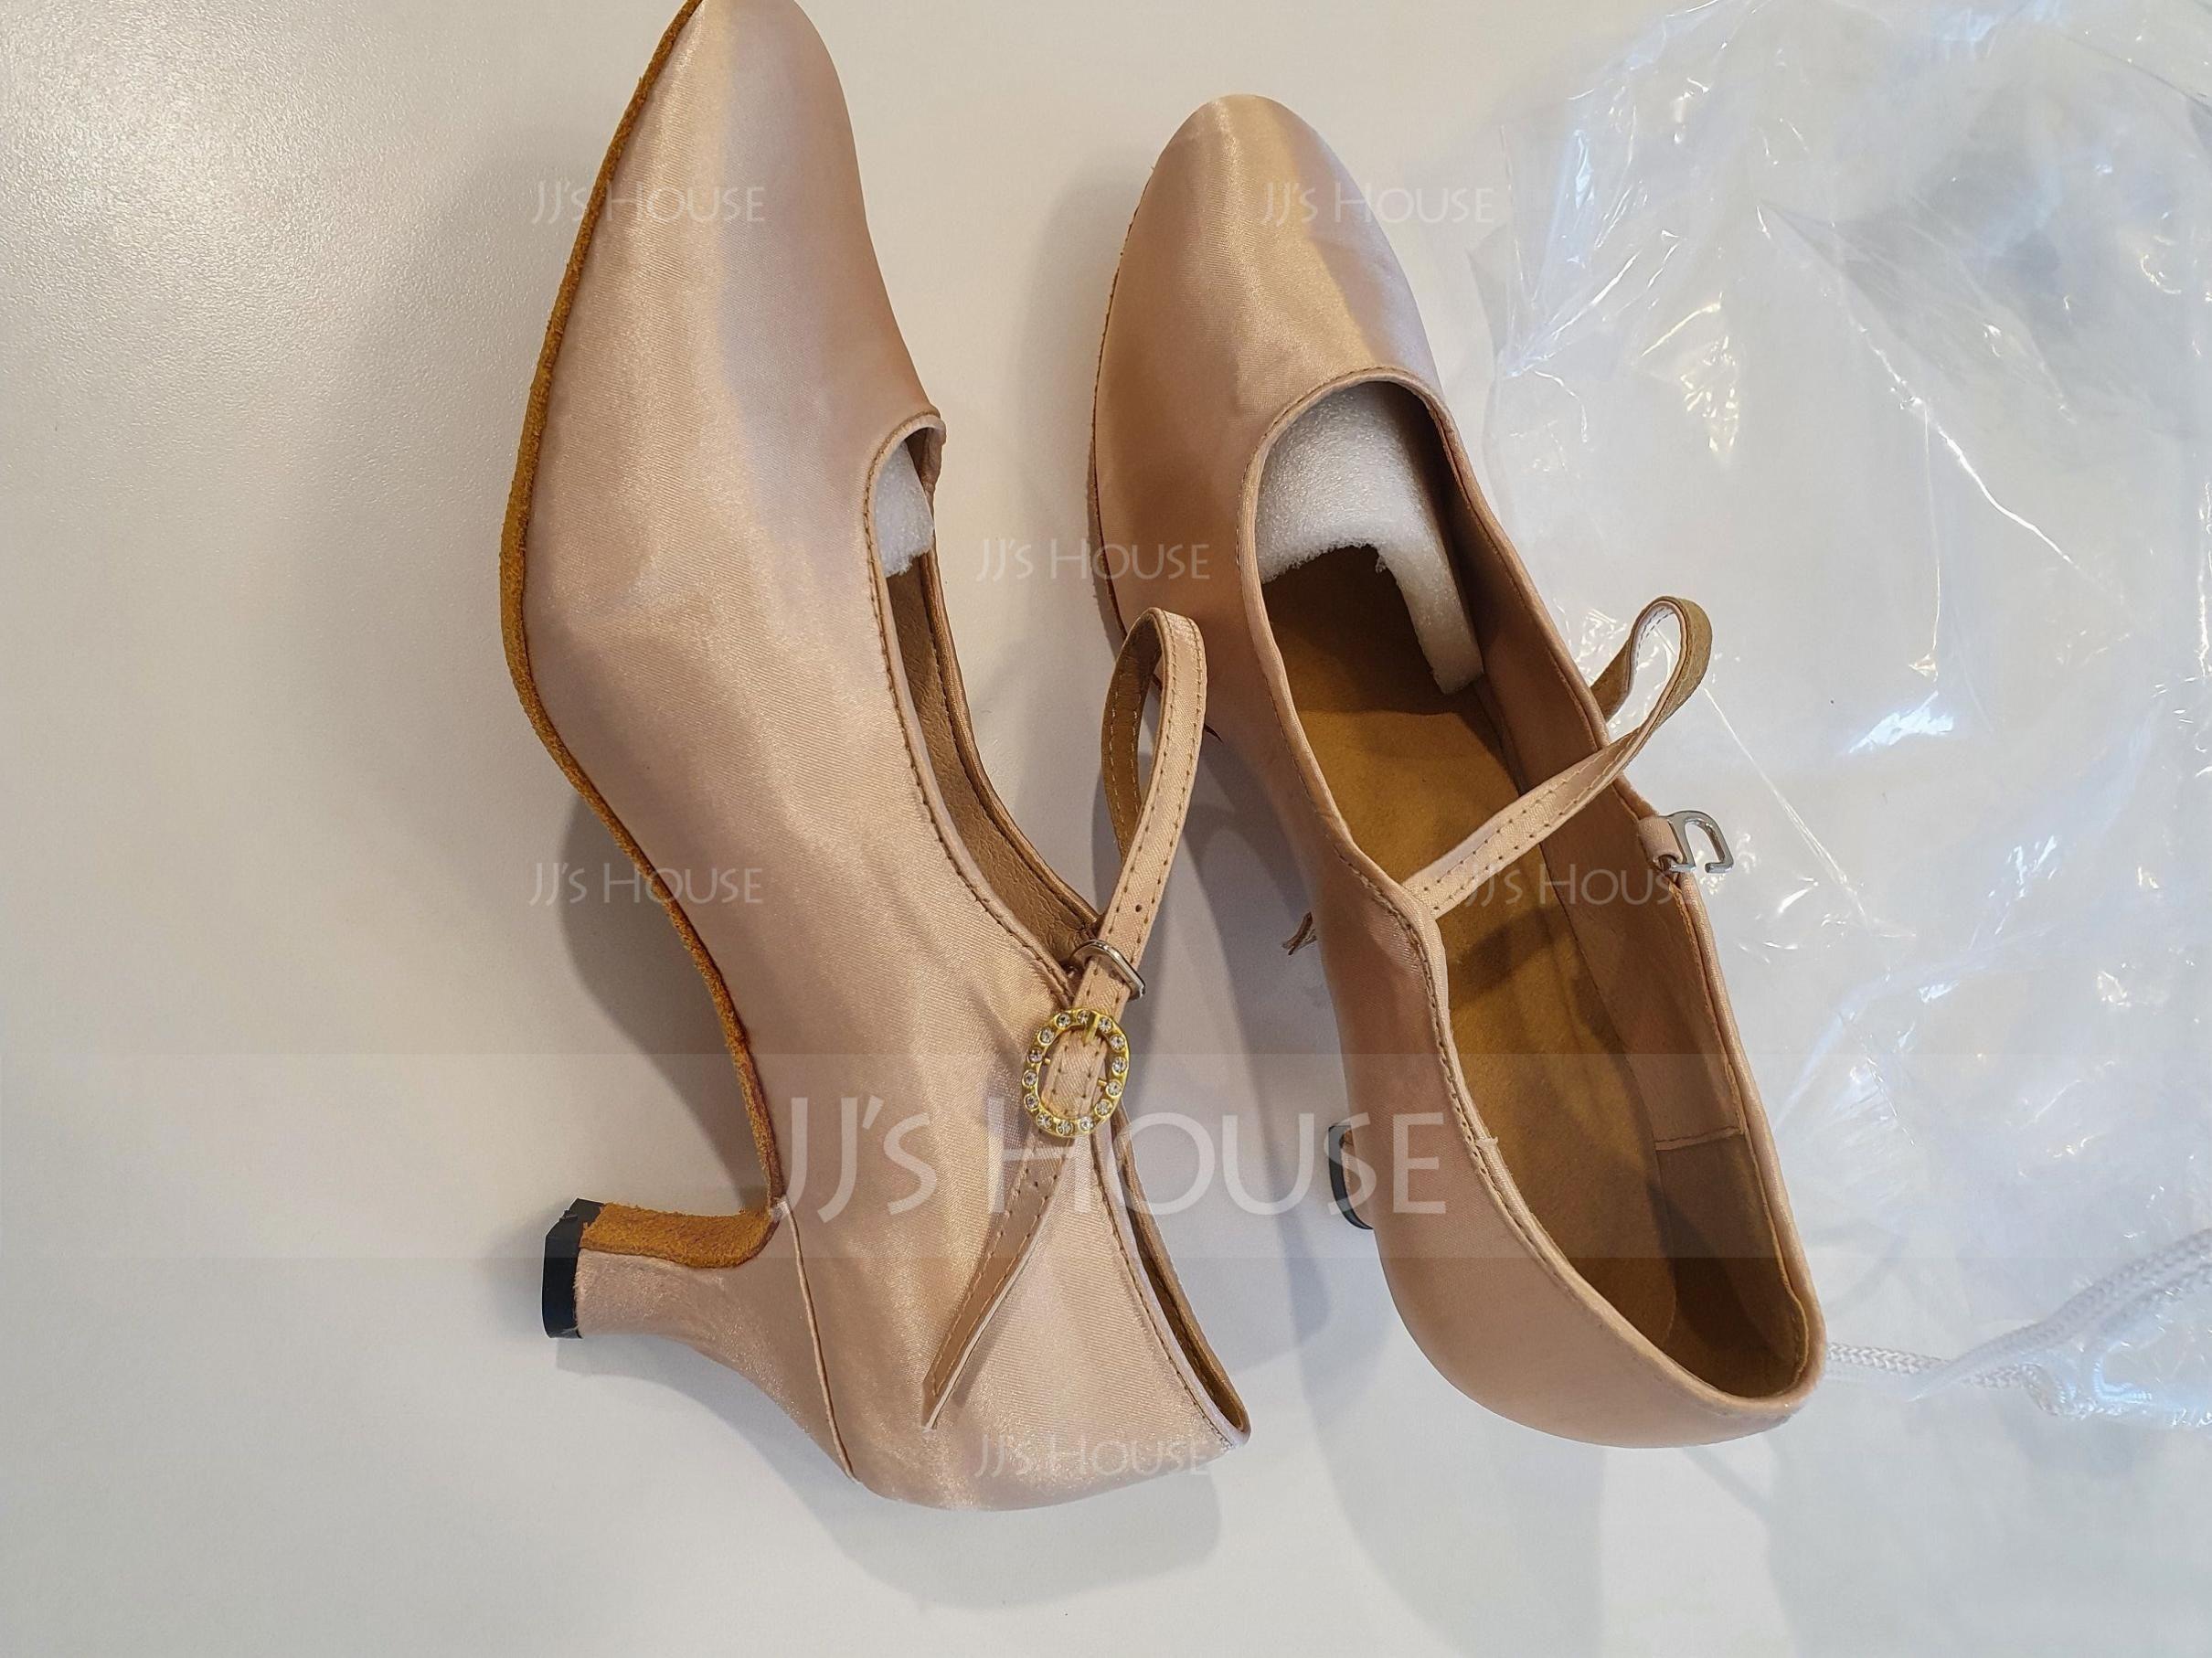 Women's Satin Heels Pumps Ballroom Dance Shoes (053090336)